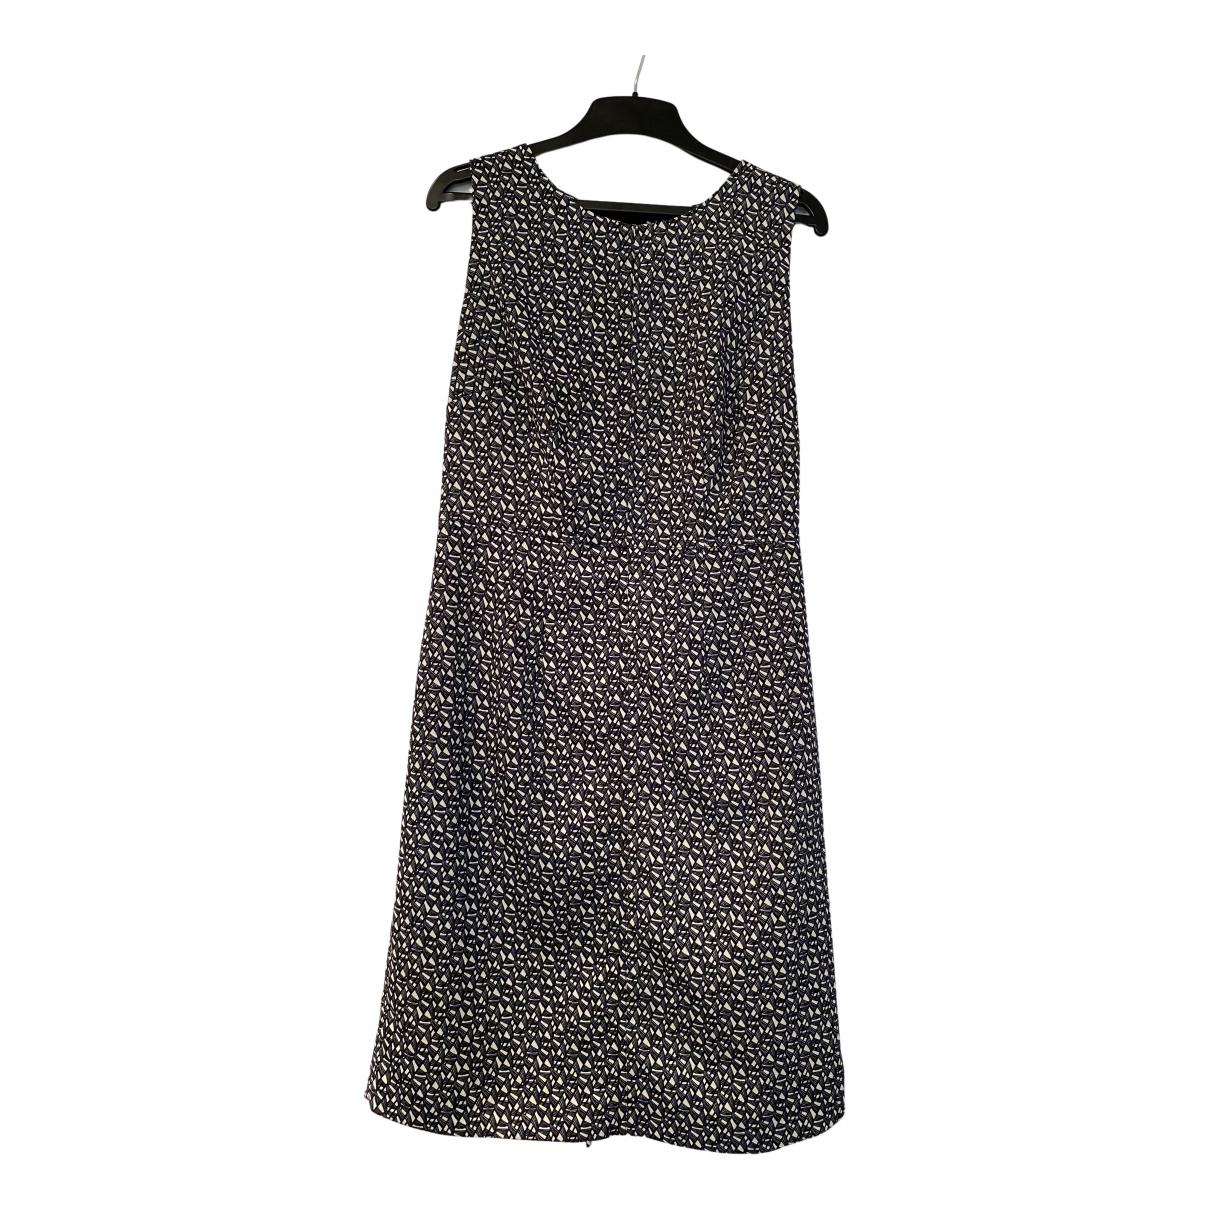 Massimo Dutti N Black dress for Women 4 US